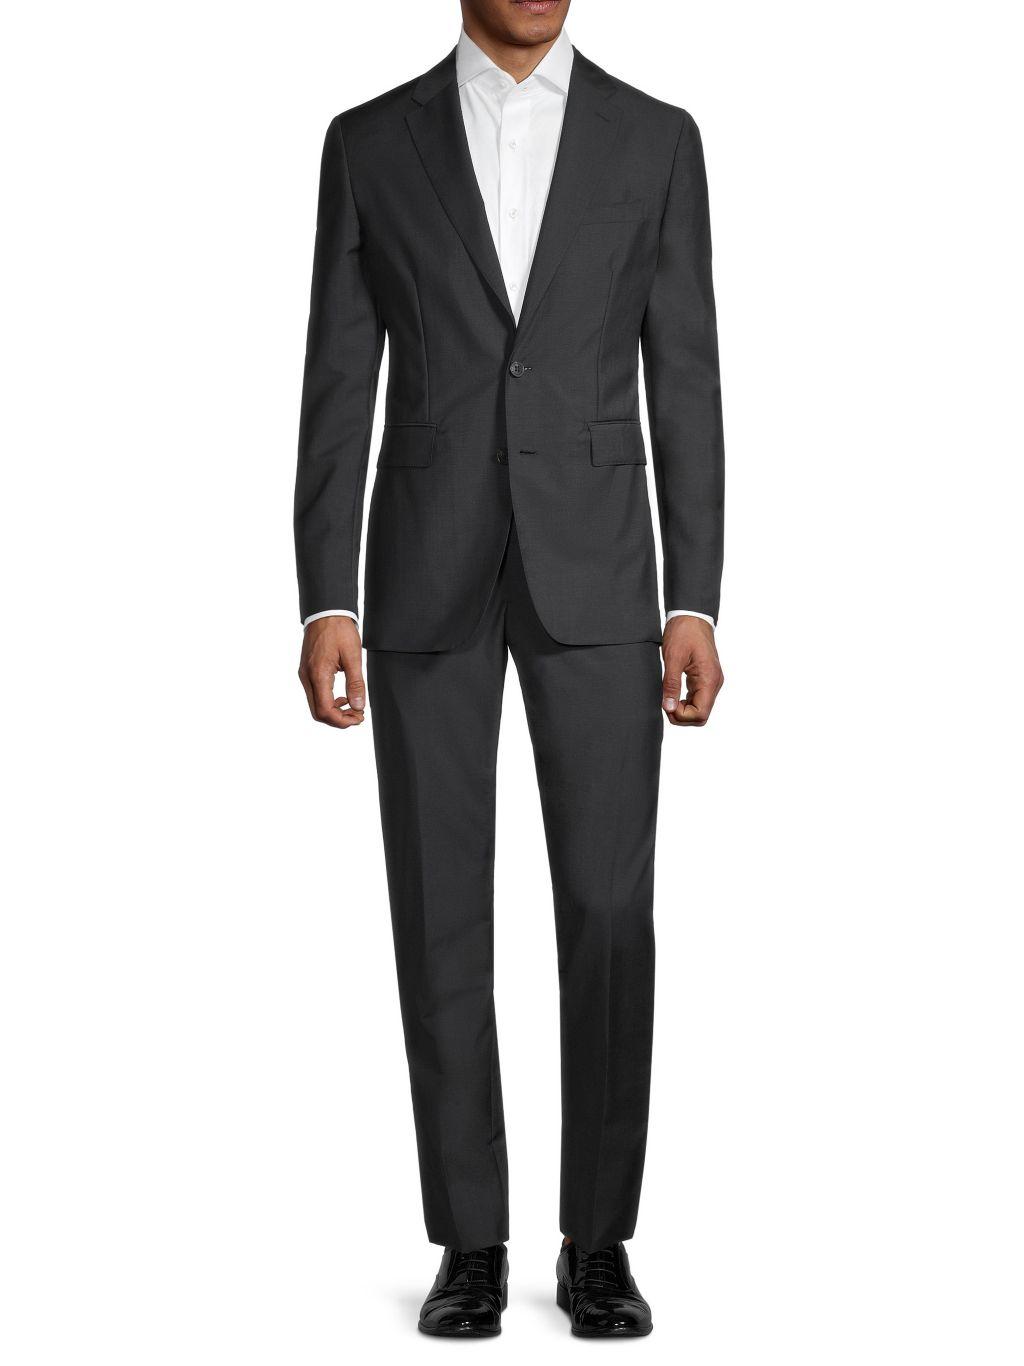 Burberry 2-Piece Standard Soho Wool & Mohair Slim-Fit Suit